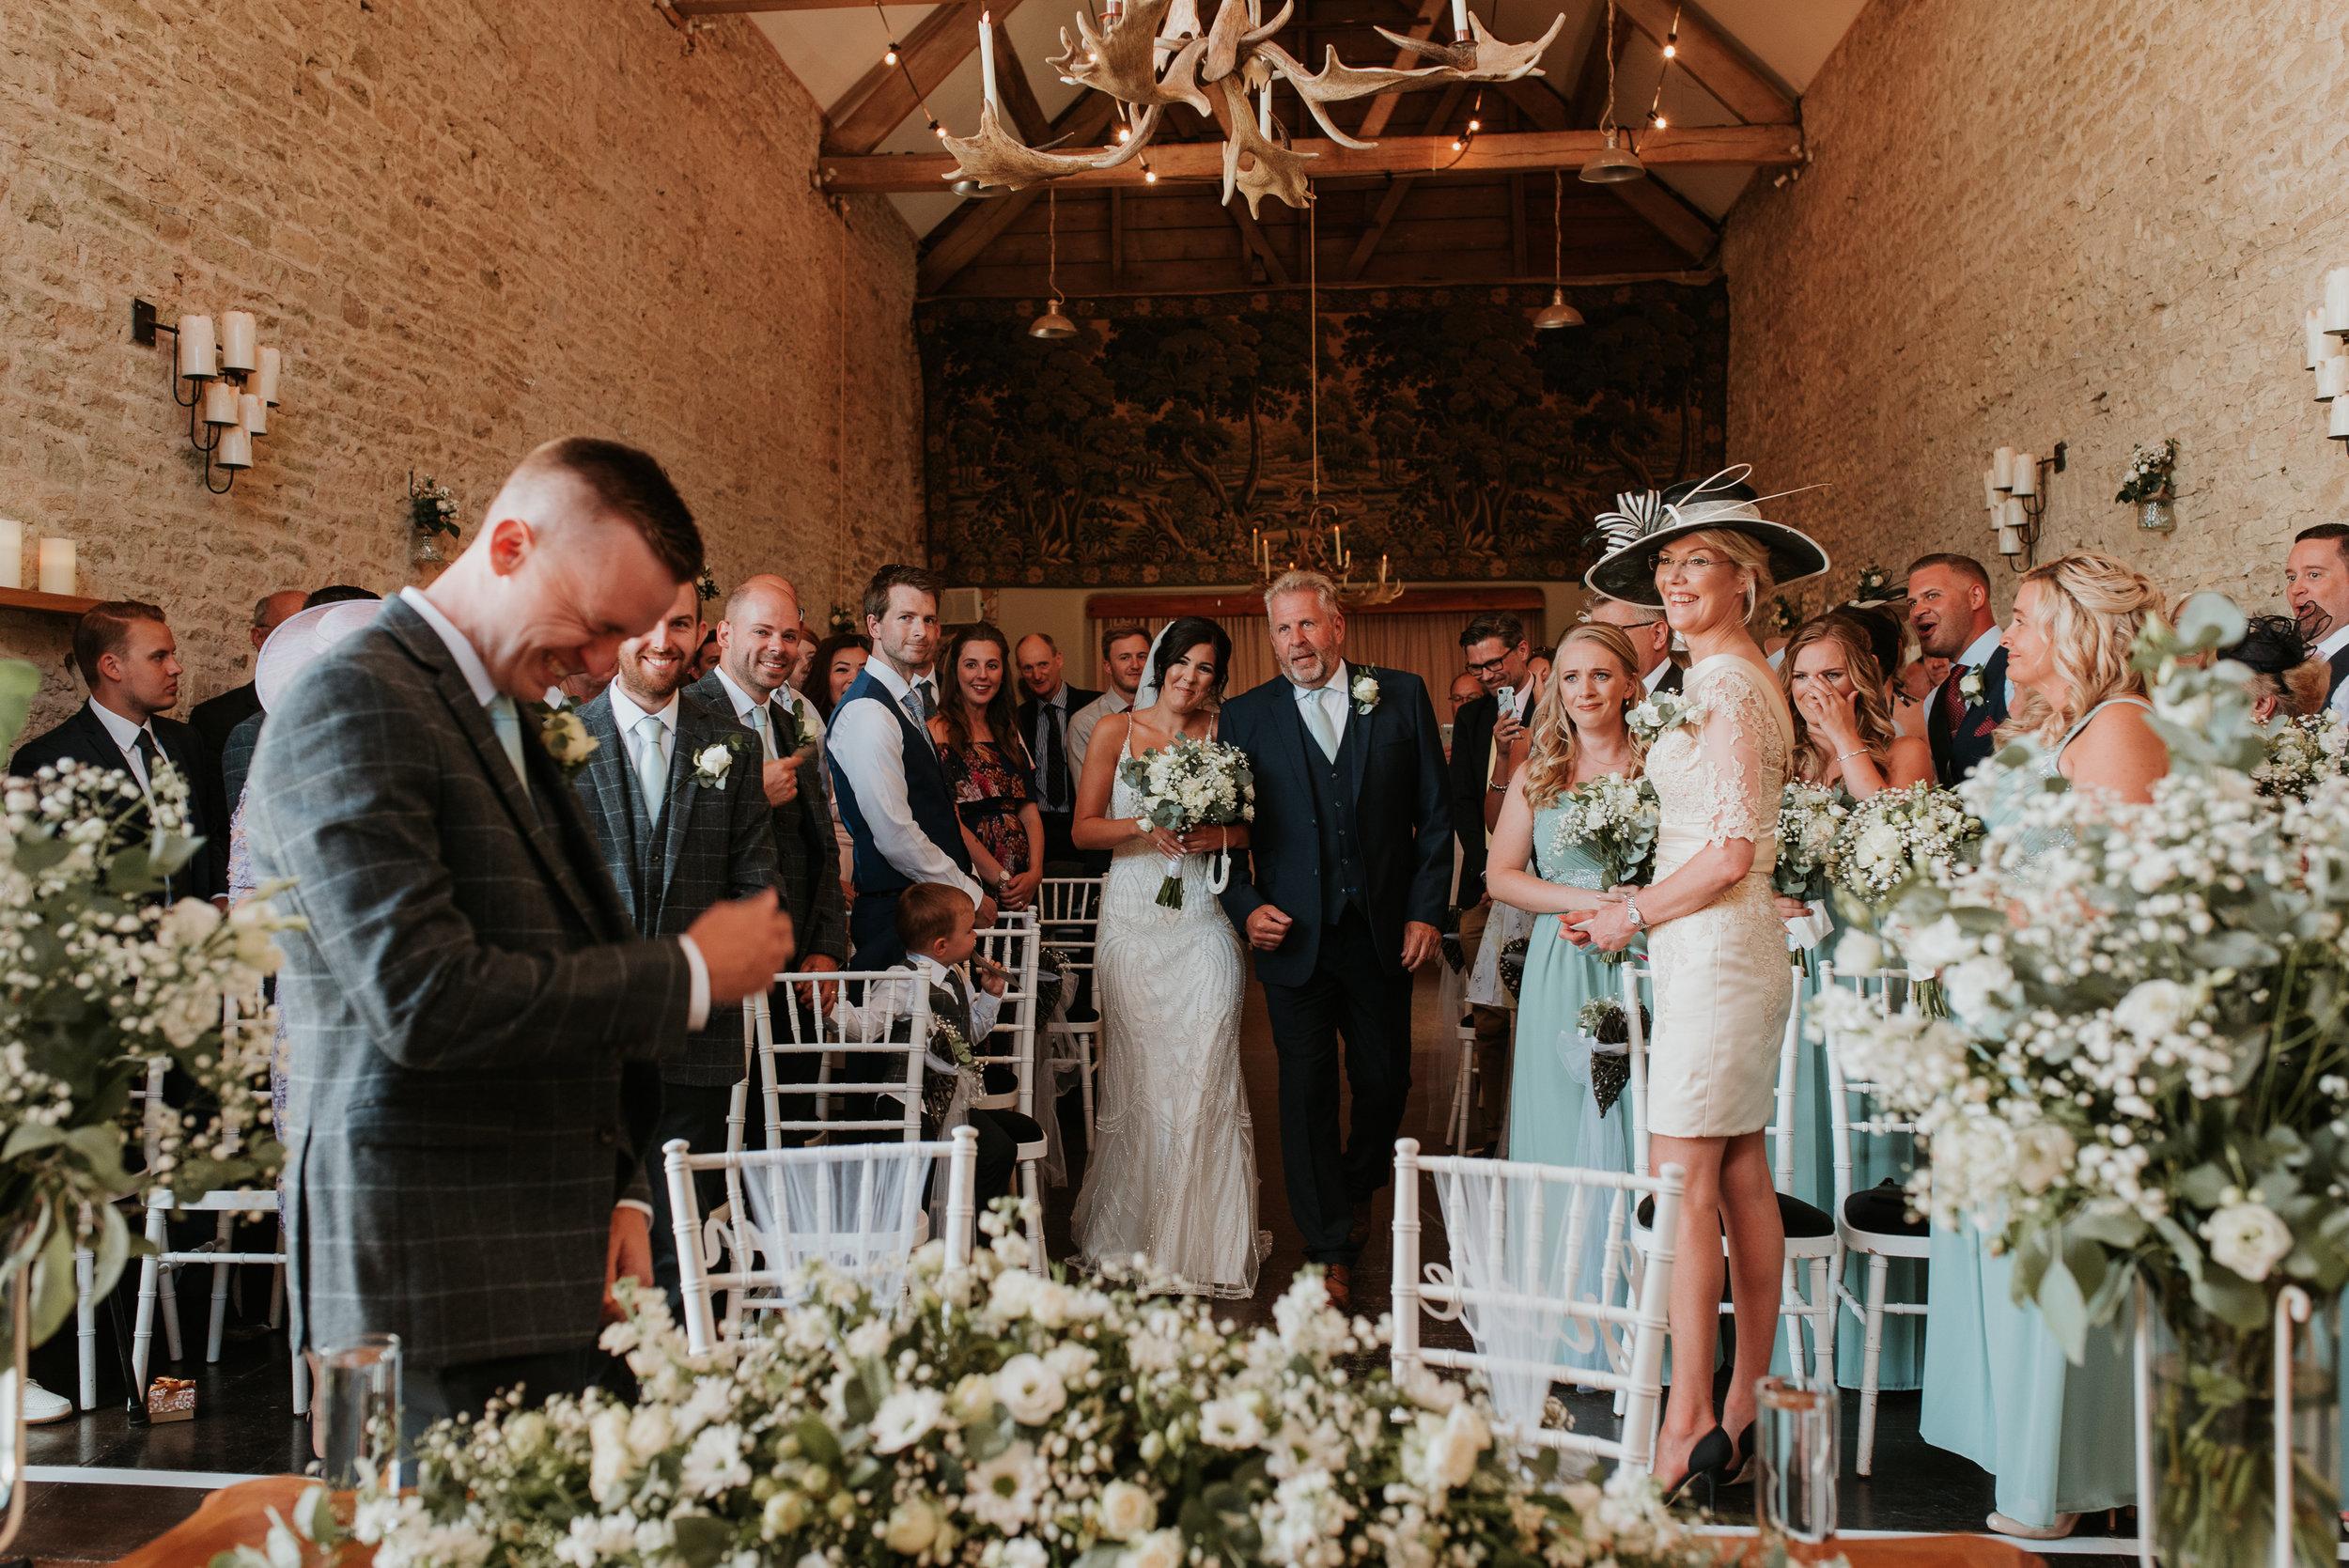 Oxfordshire-wedding-photographer-33.jpg